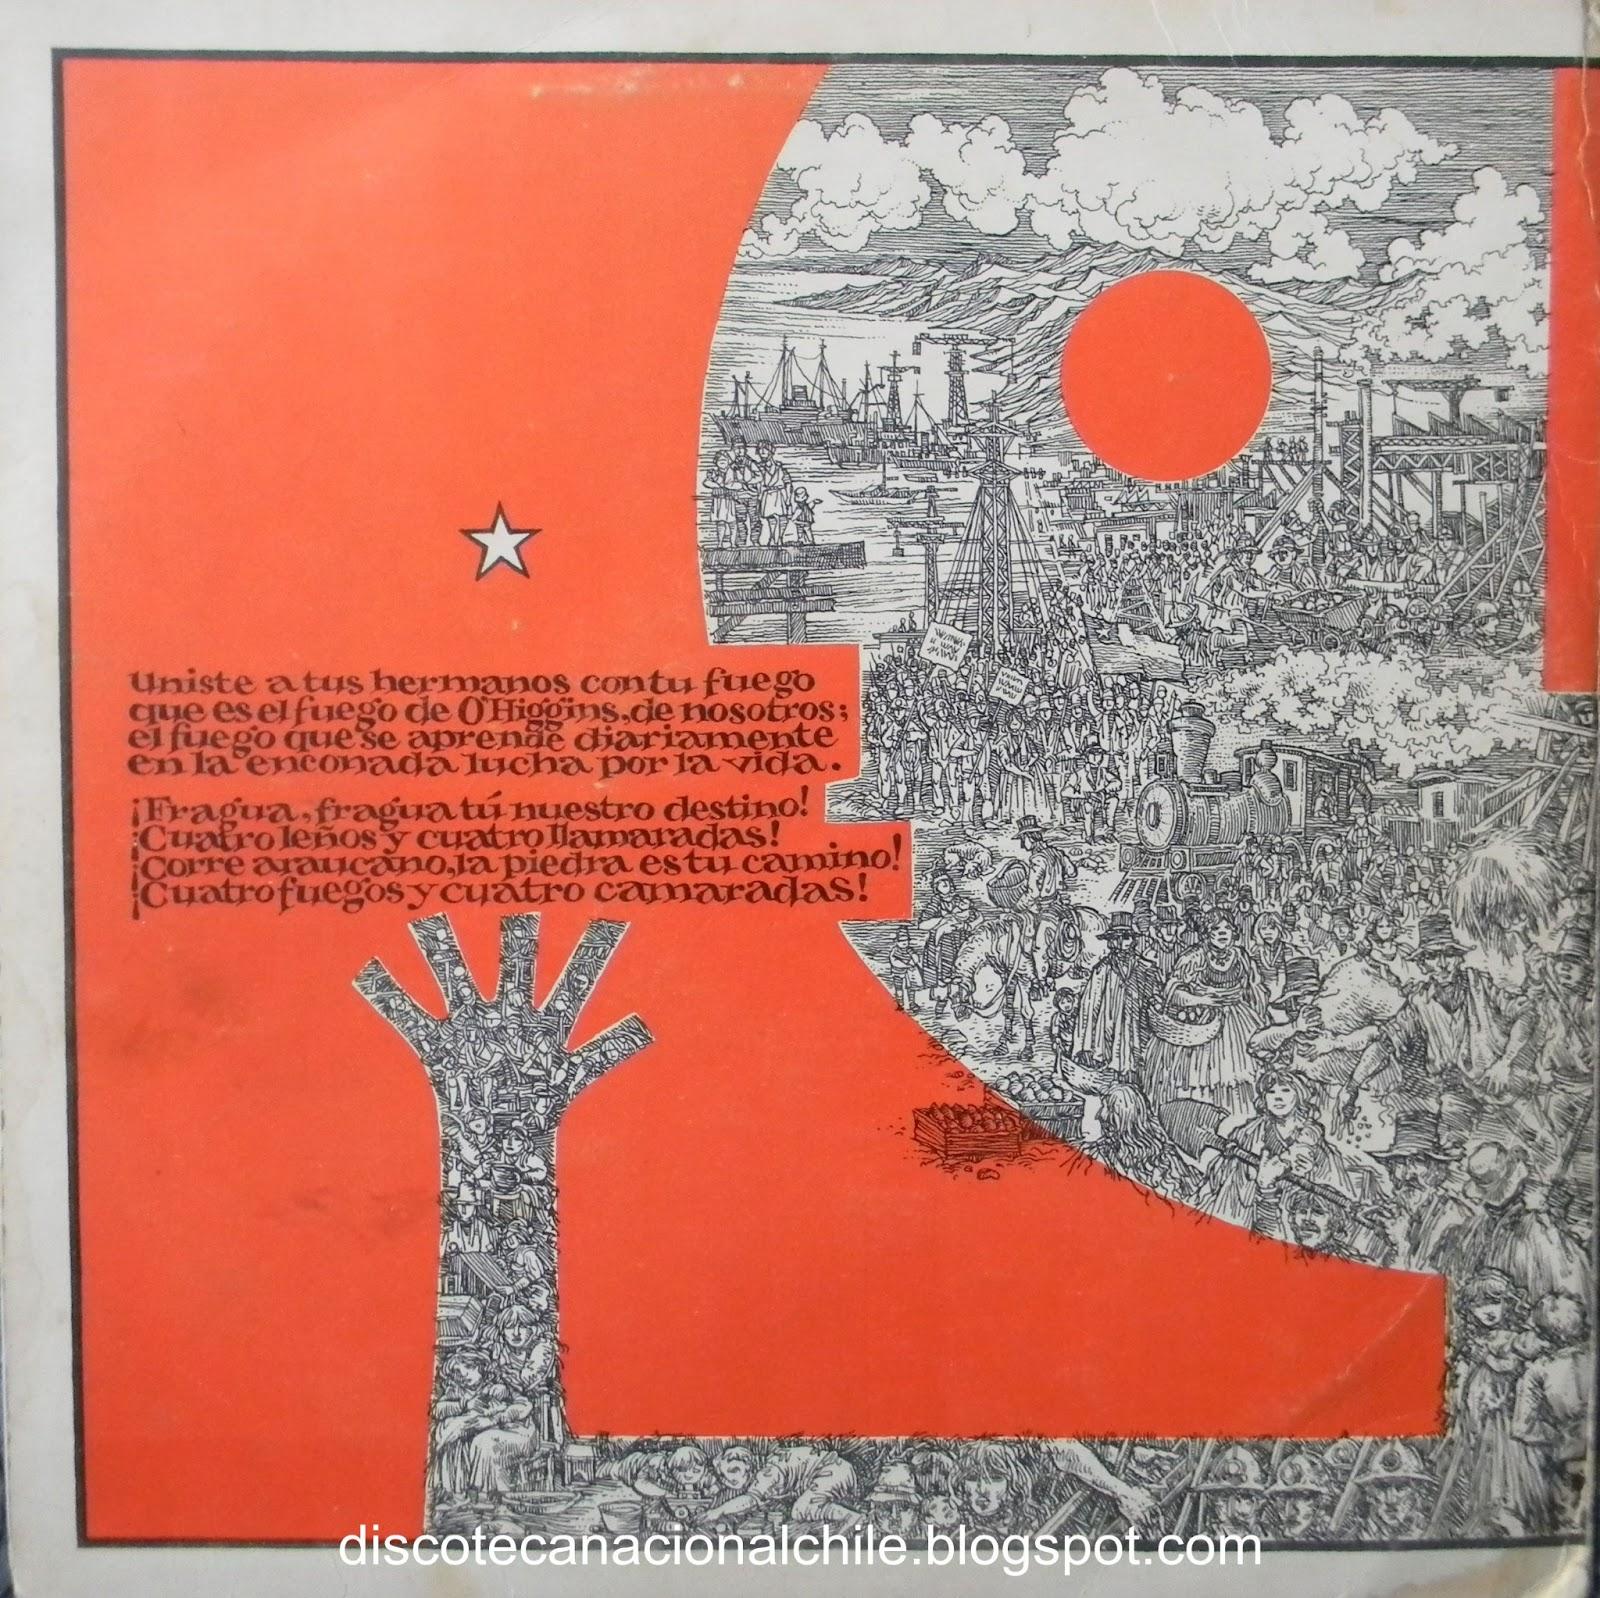 Discoteca Nacional Chile: Quilapayún: La Fragua.JJLS-17. Dicap. 1973 ...